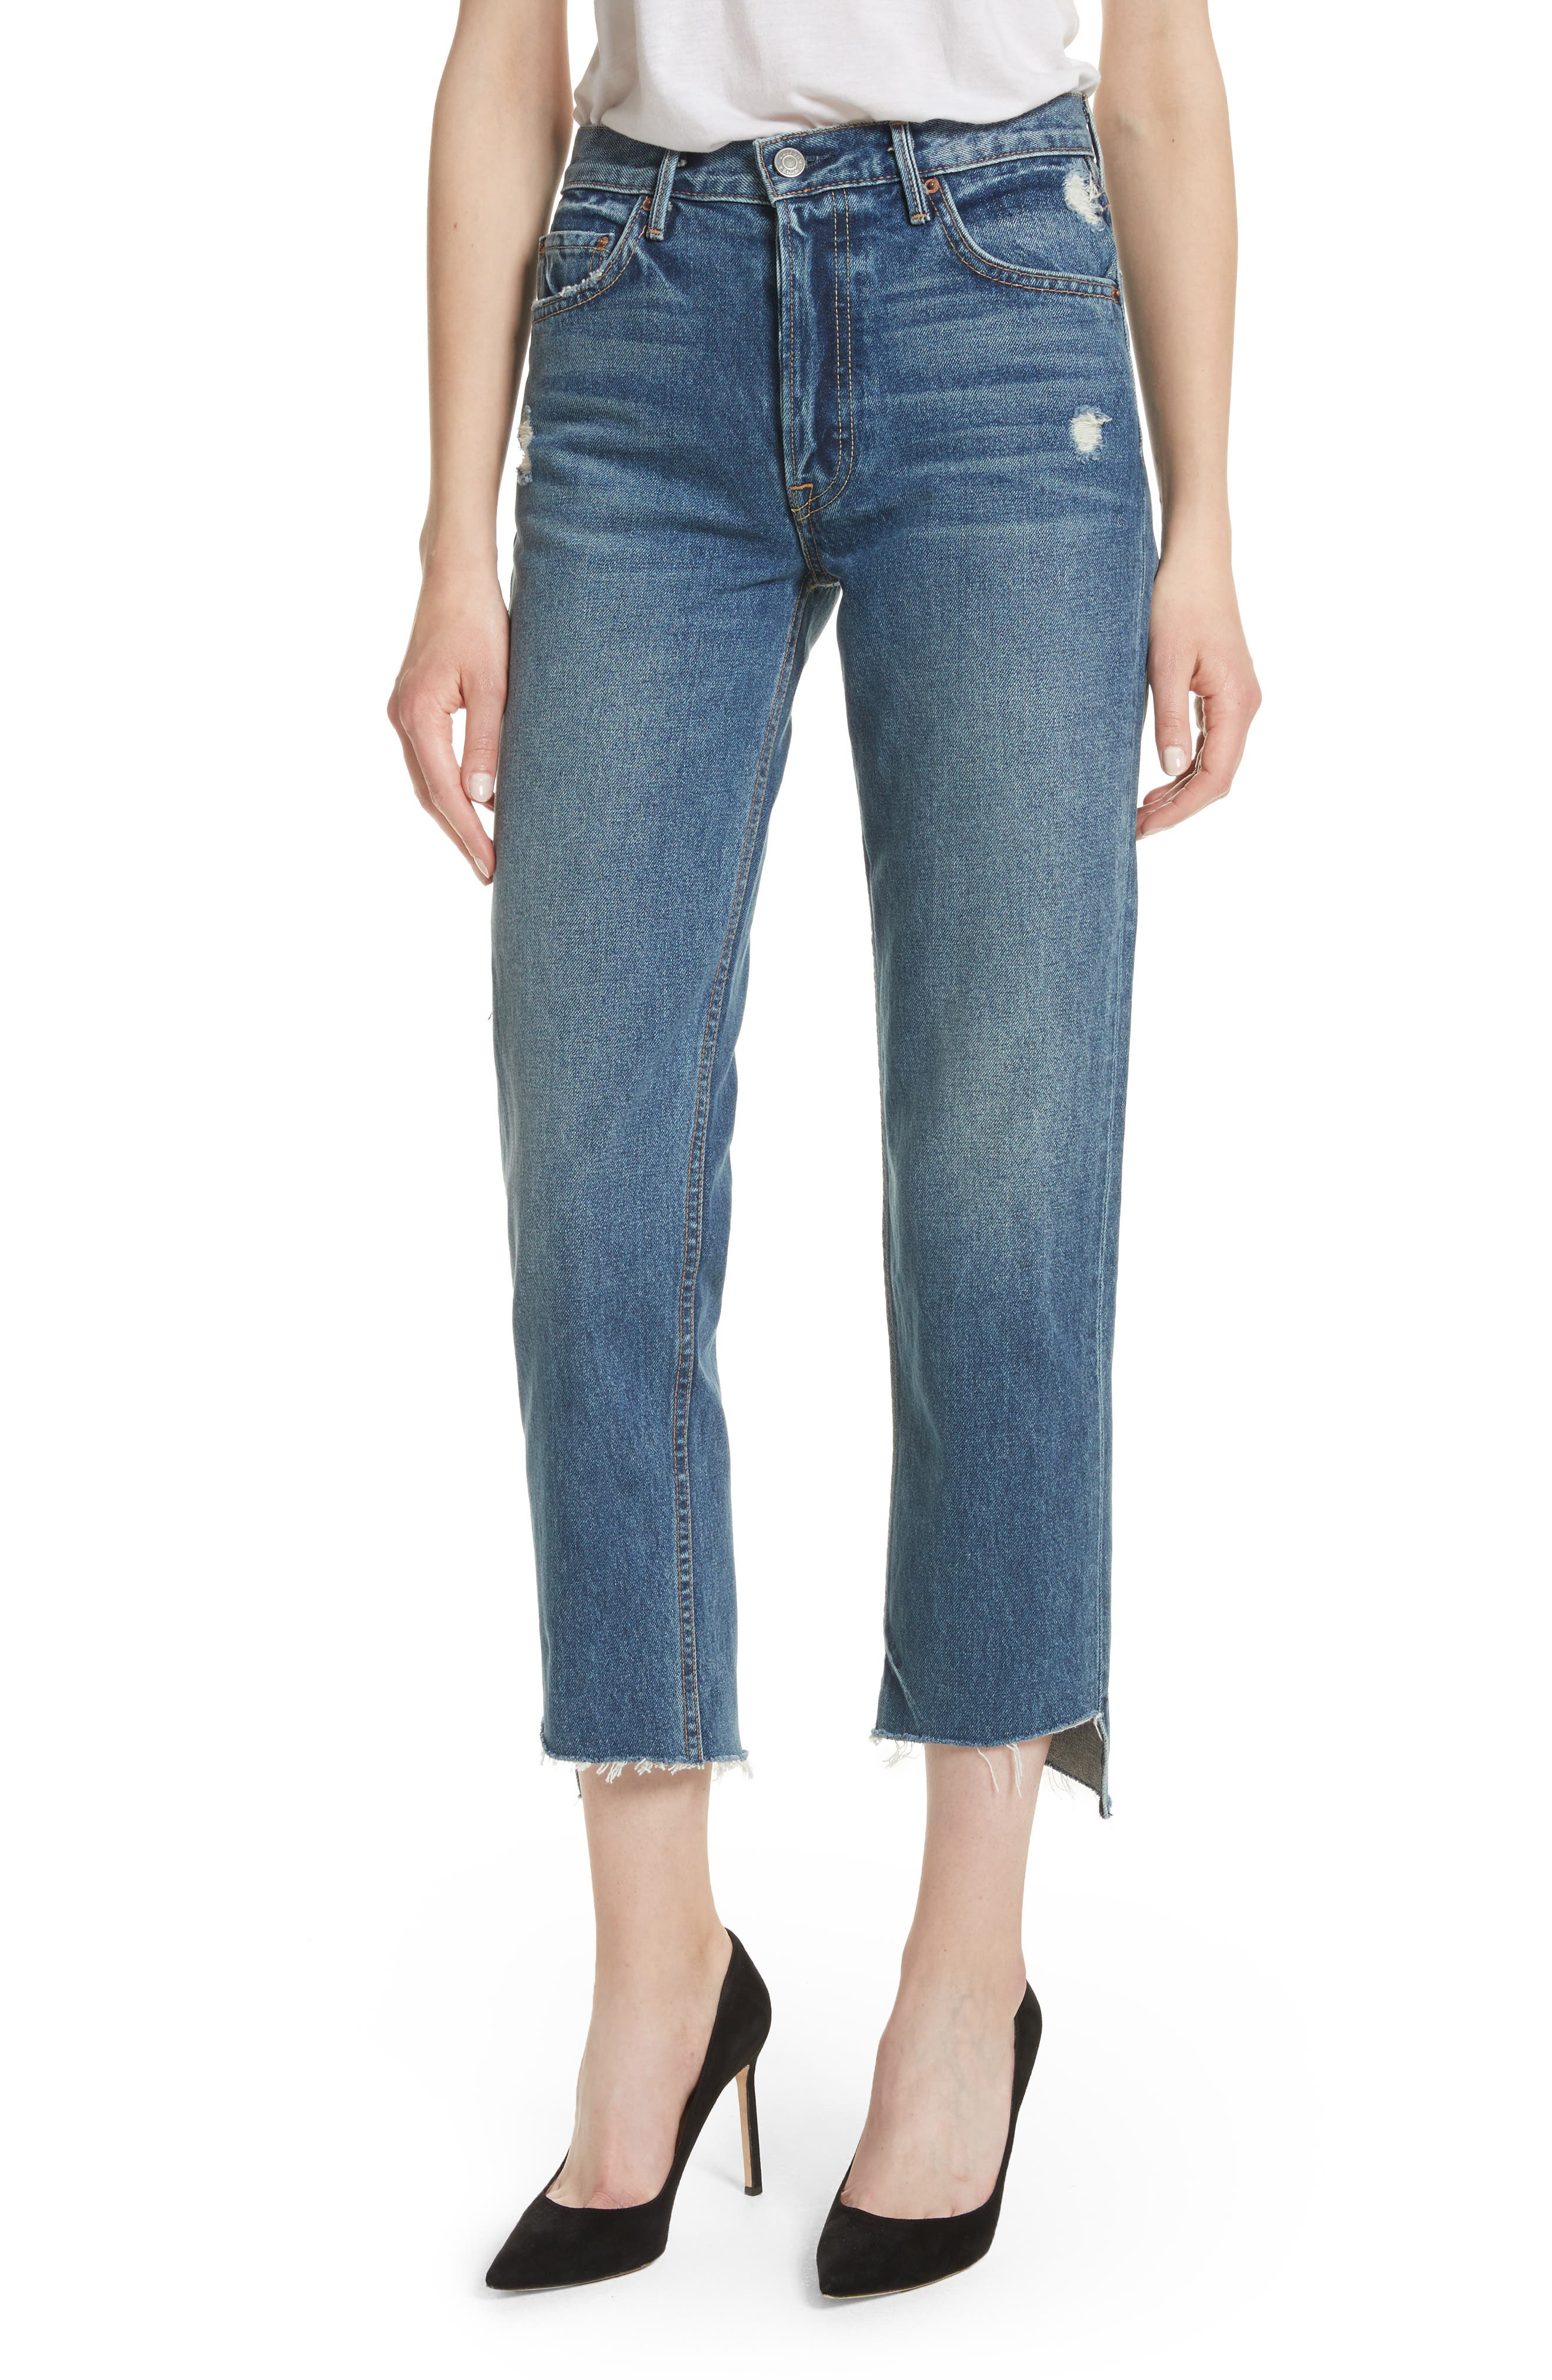 Helena Rigid High Waist Straight Jeans,                         Main,                         color, Close To You